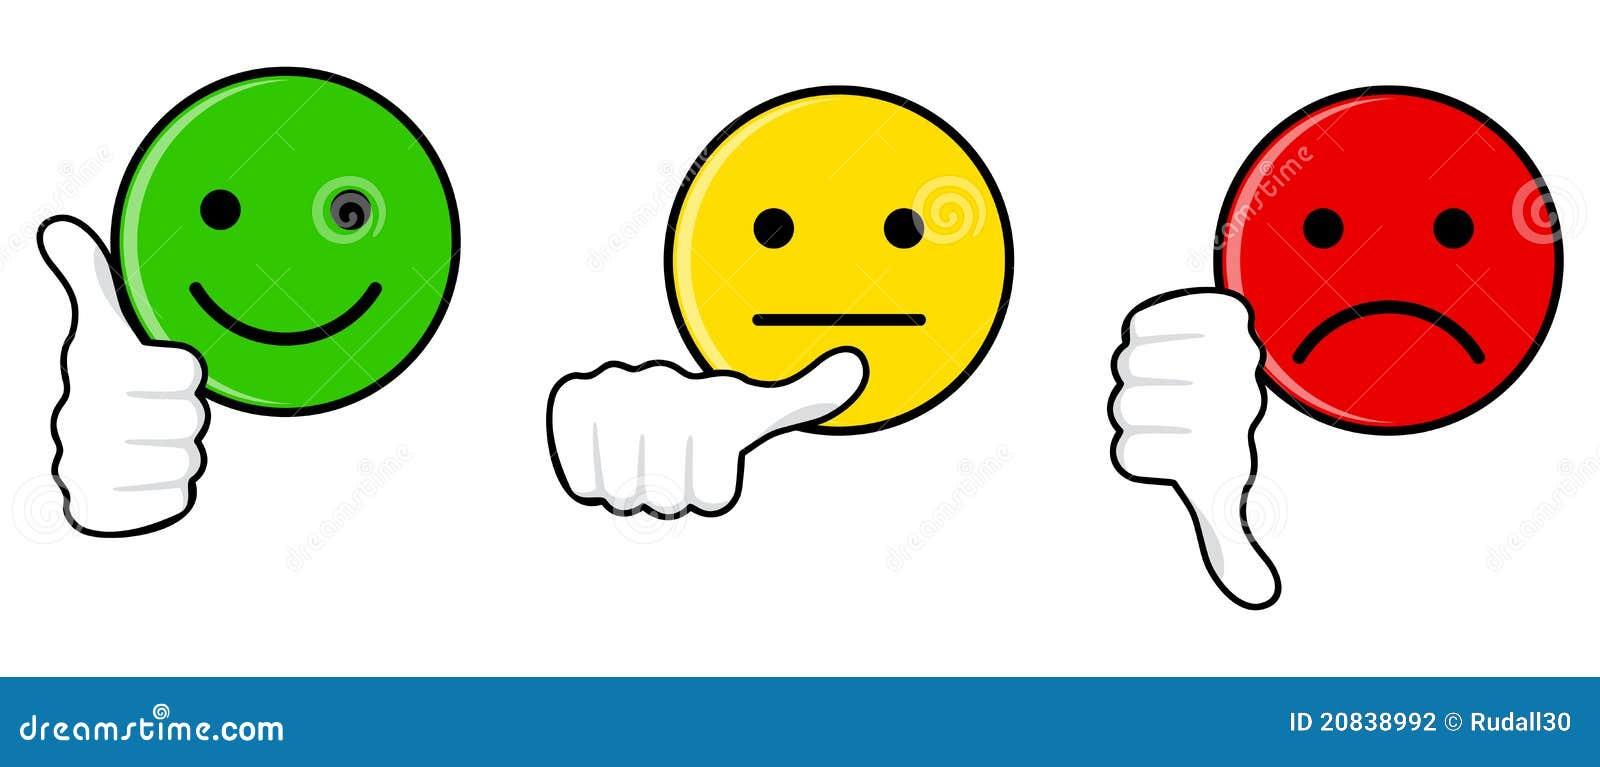 Stock Photography  Satisfaction Level IconsSatisfied Customer Icon